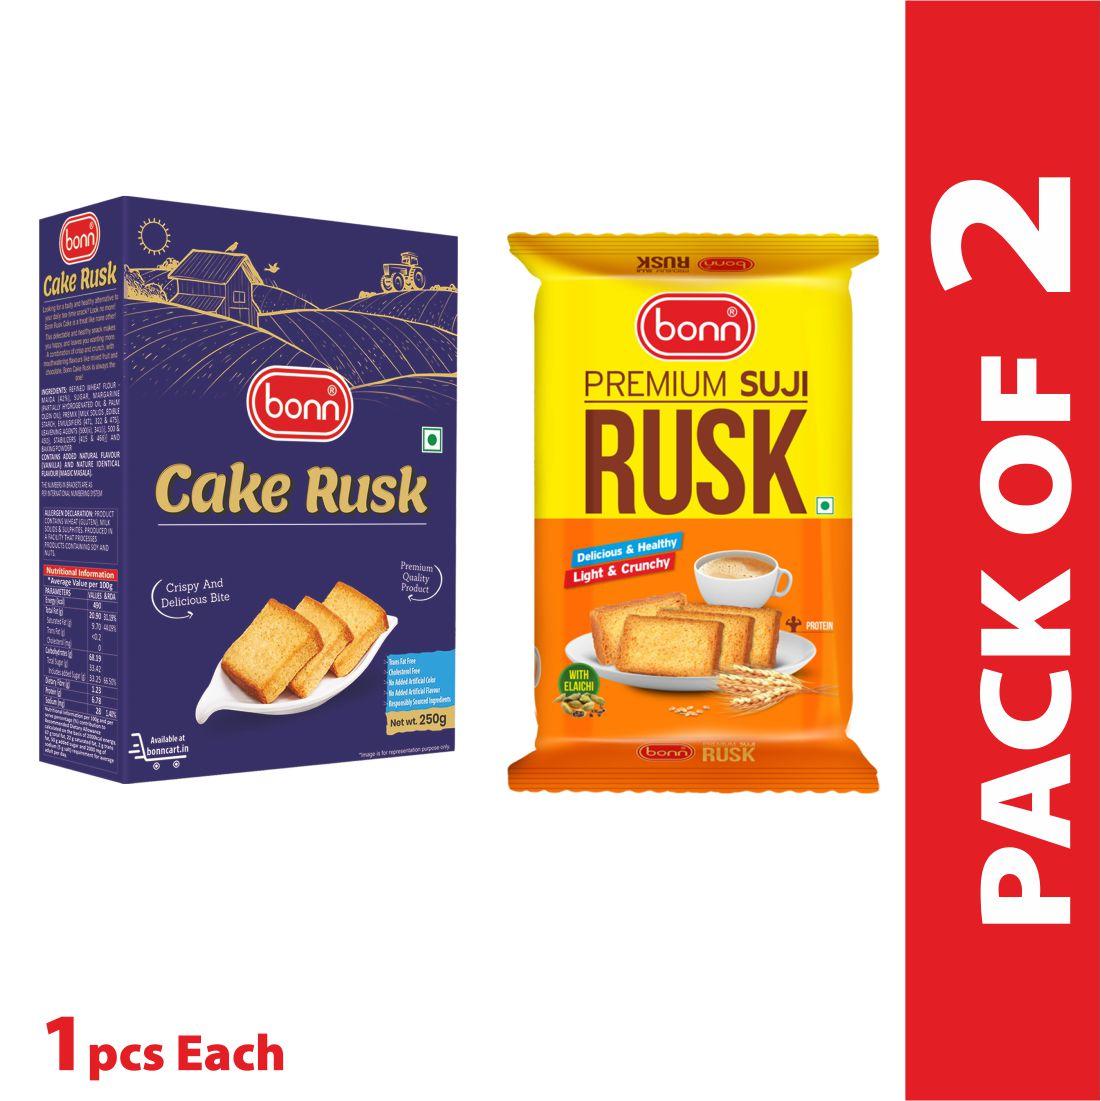 Bonn rusk combo (Cake and Suji 275g) Elaichi and Plain Flavour(1 Pack each)